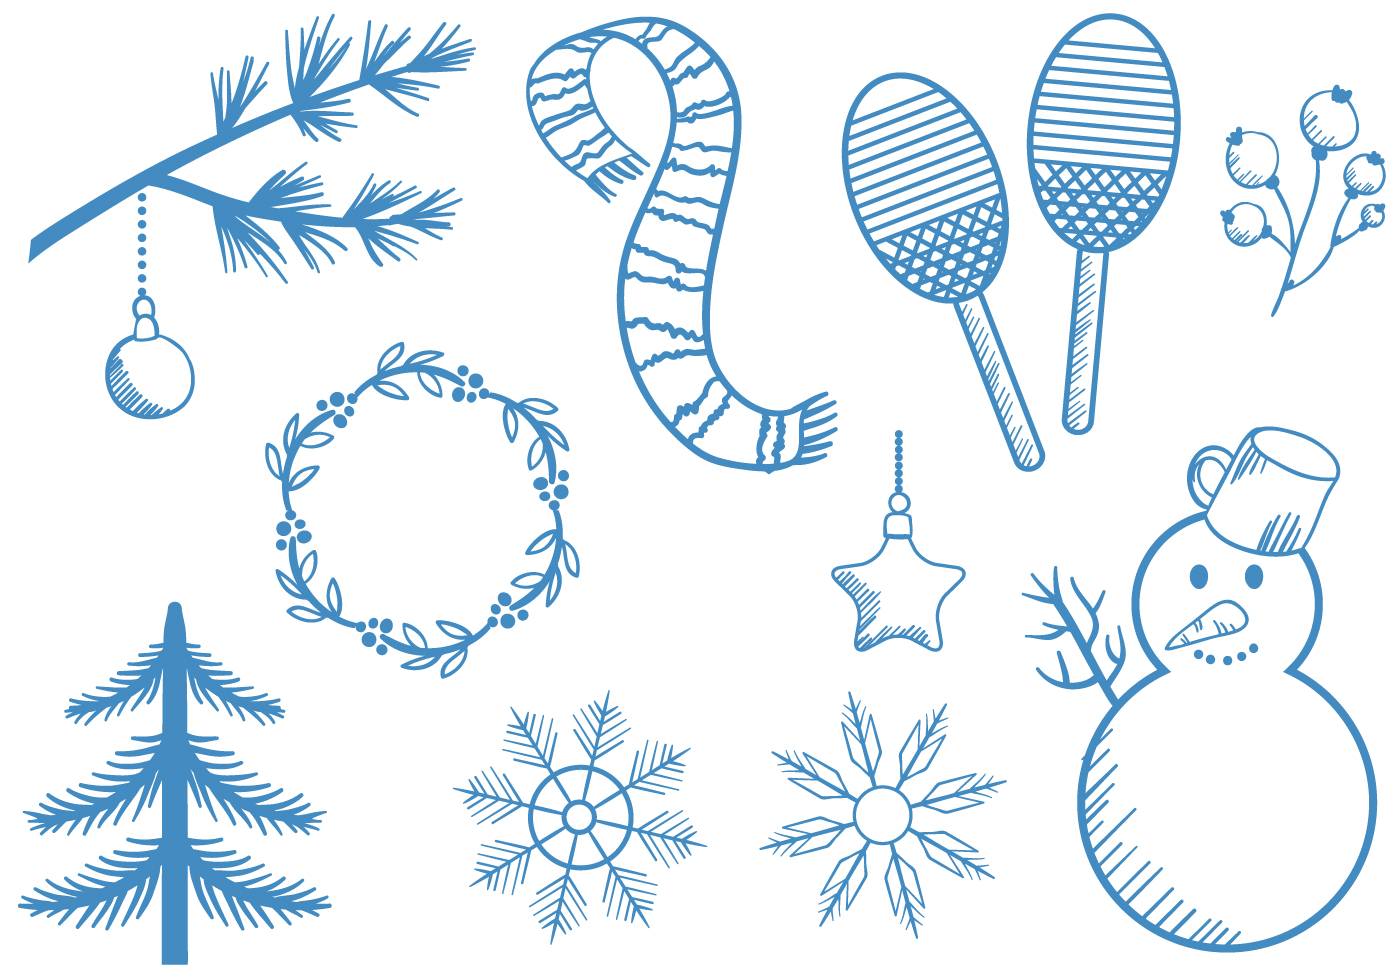 Free Vintage Winter Vectors - Download Free Vectors ...